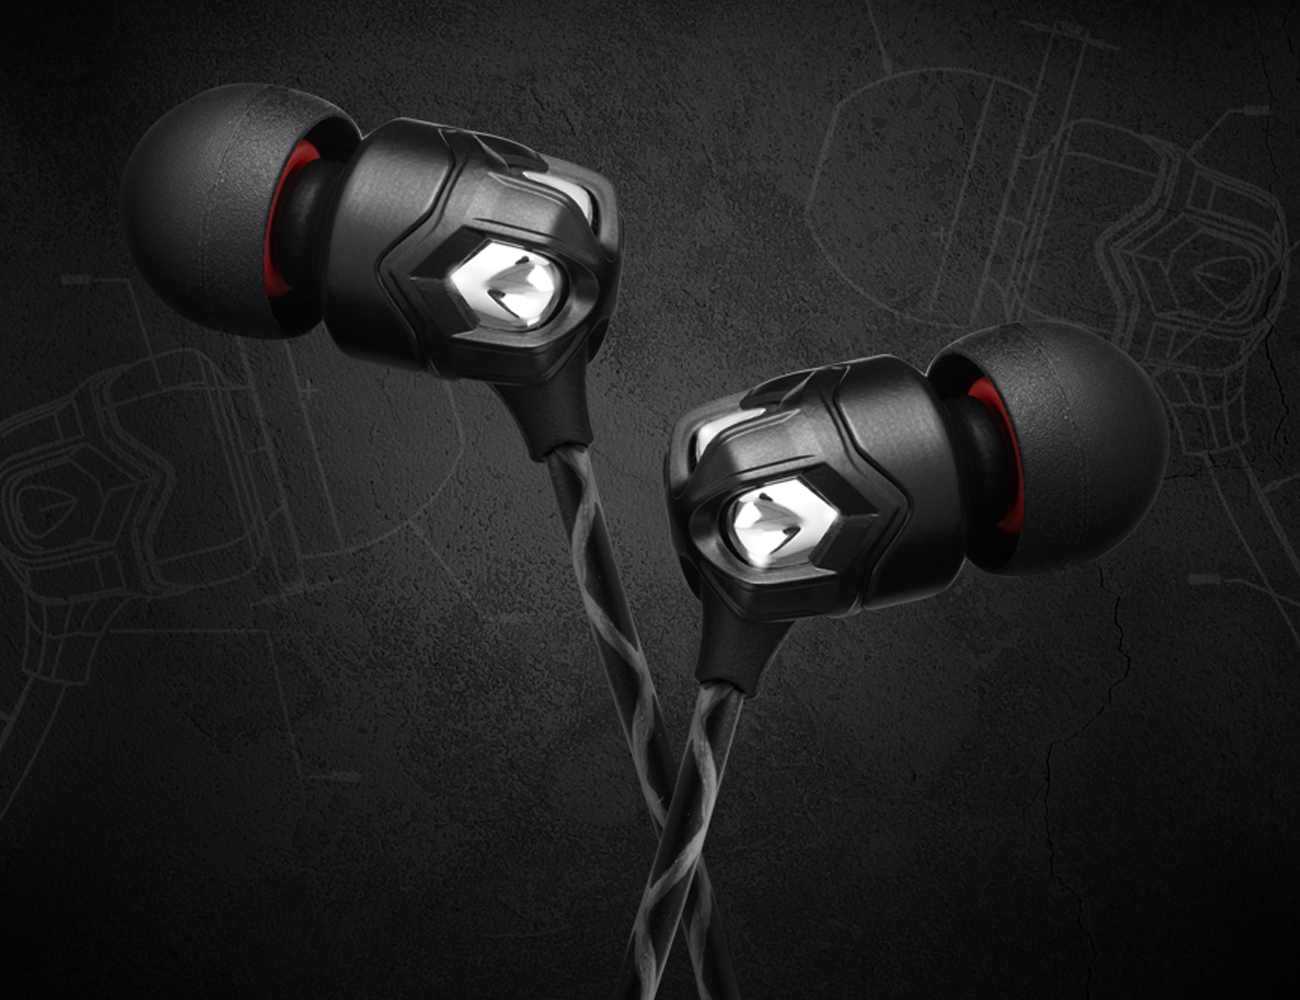 V-MODA Zn – Limited Edition In-Ear Headphones